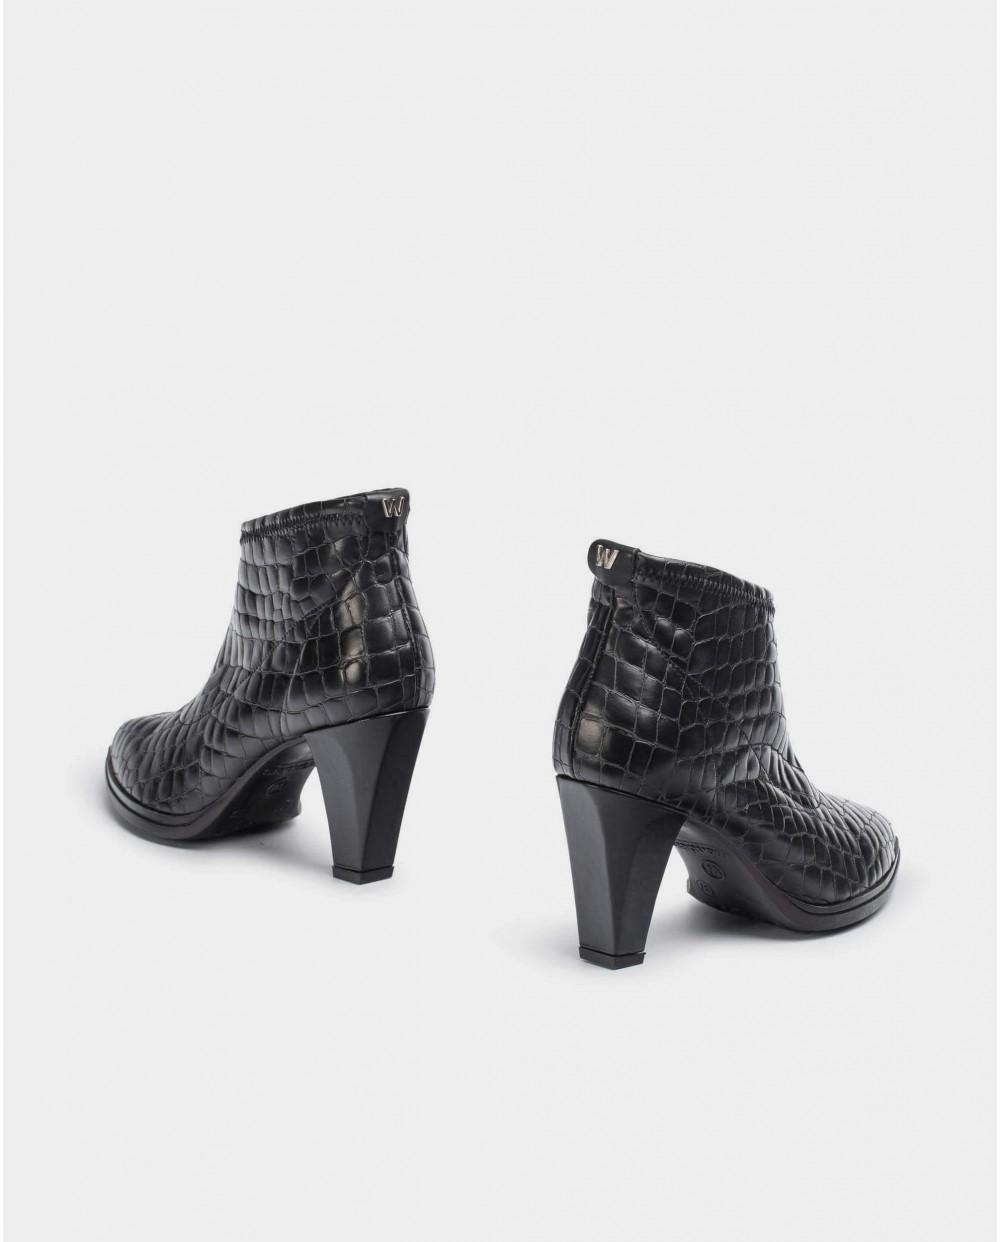 Wonders-Ankle Boots-Black Moc-crock Elastic Ankle Boot